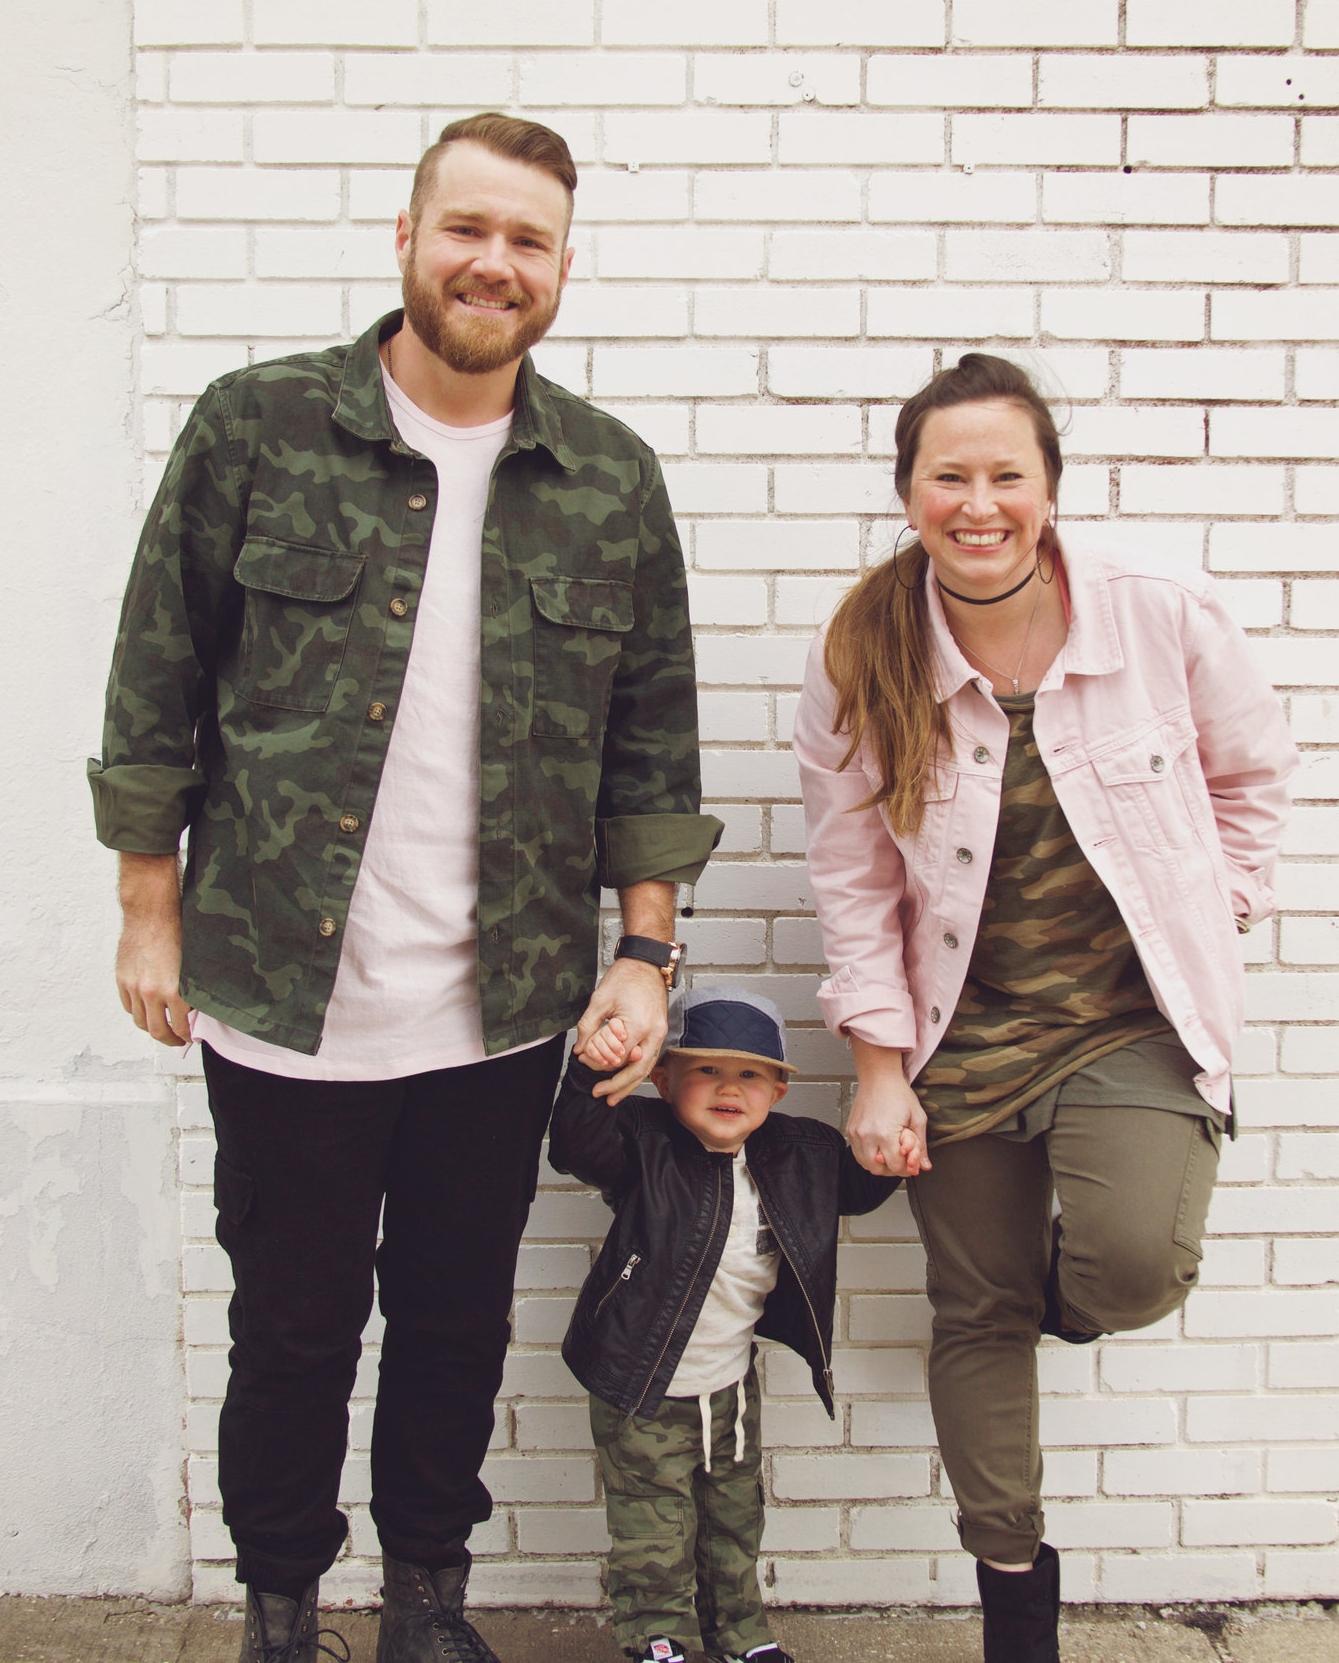 Leader:  Brandon & Natalie Self  When:  Sundays @ 6pm  Location:  Rosenberg  Age:  18-26